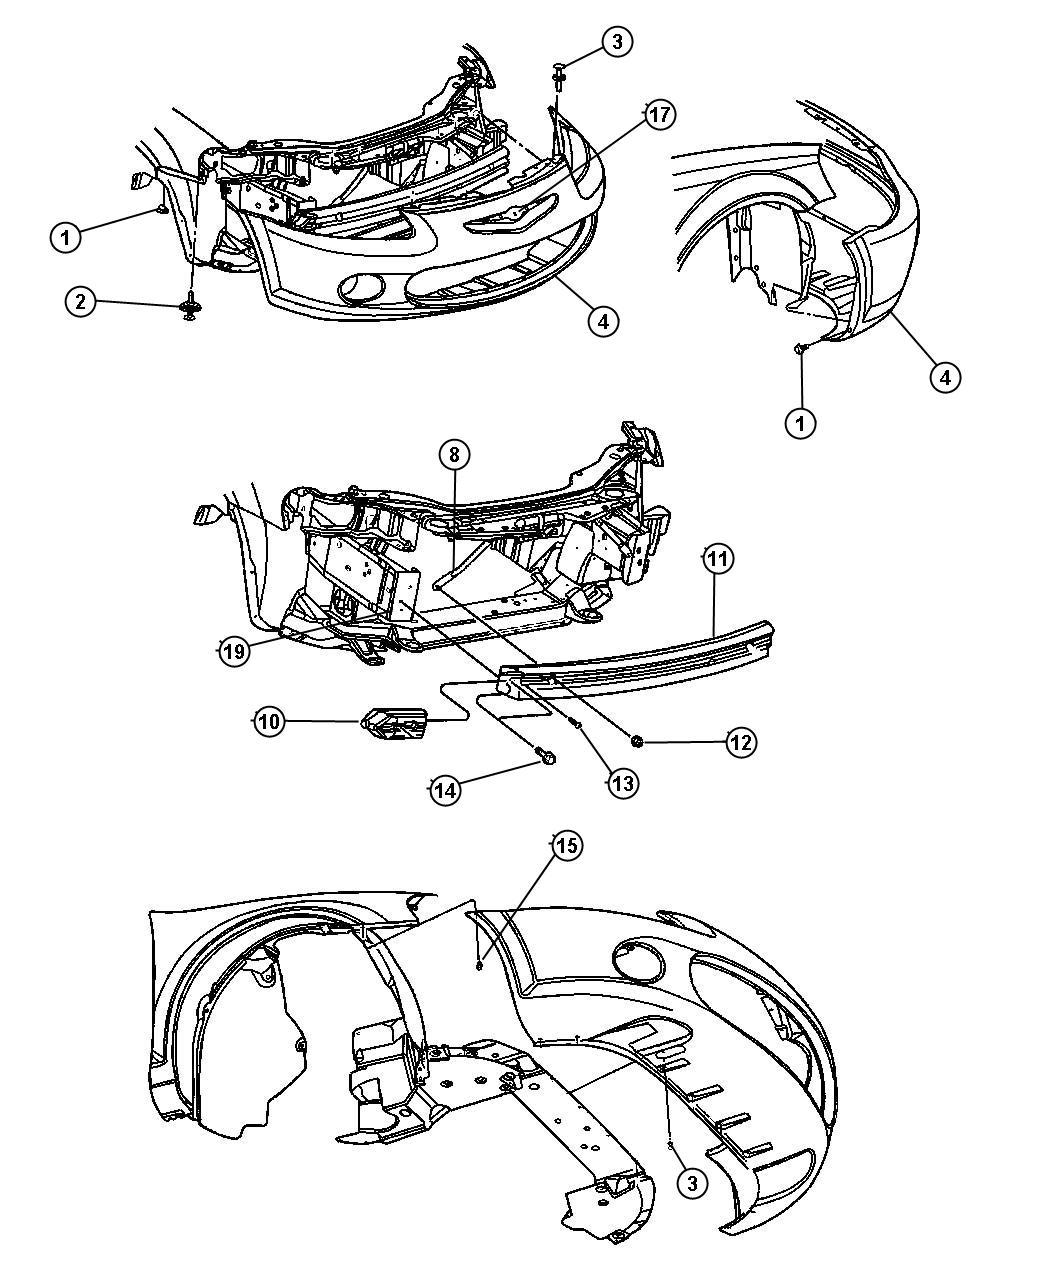 Chrysler Sebring Convertible Lxi 2 7l V6 A T Absorber